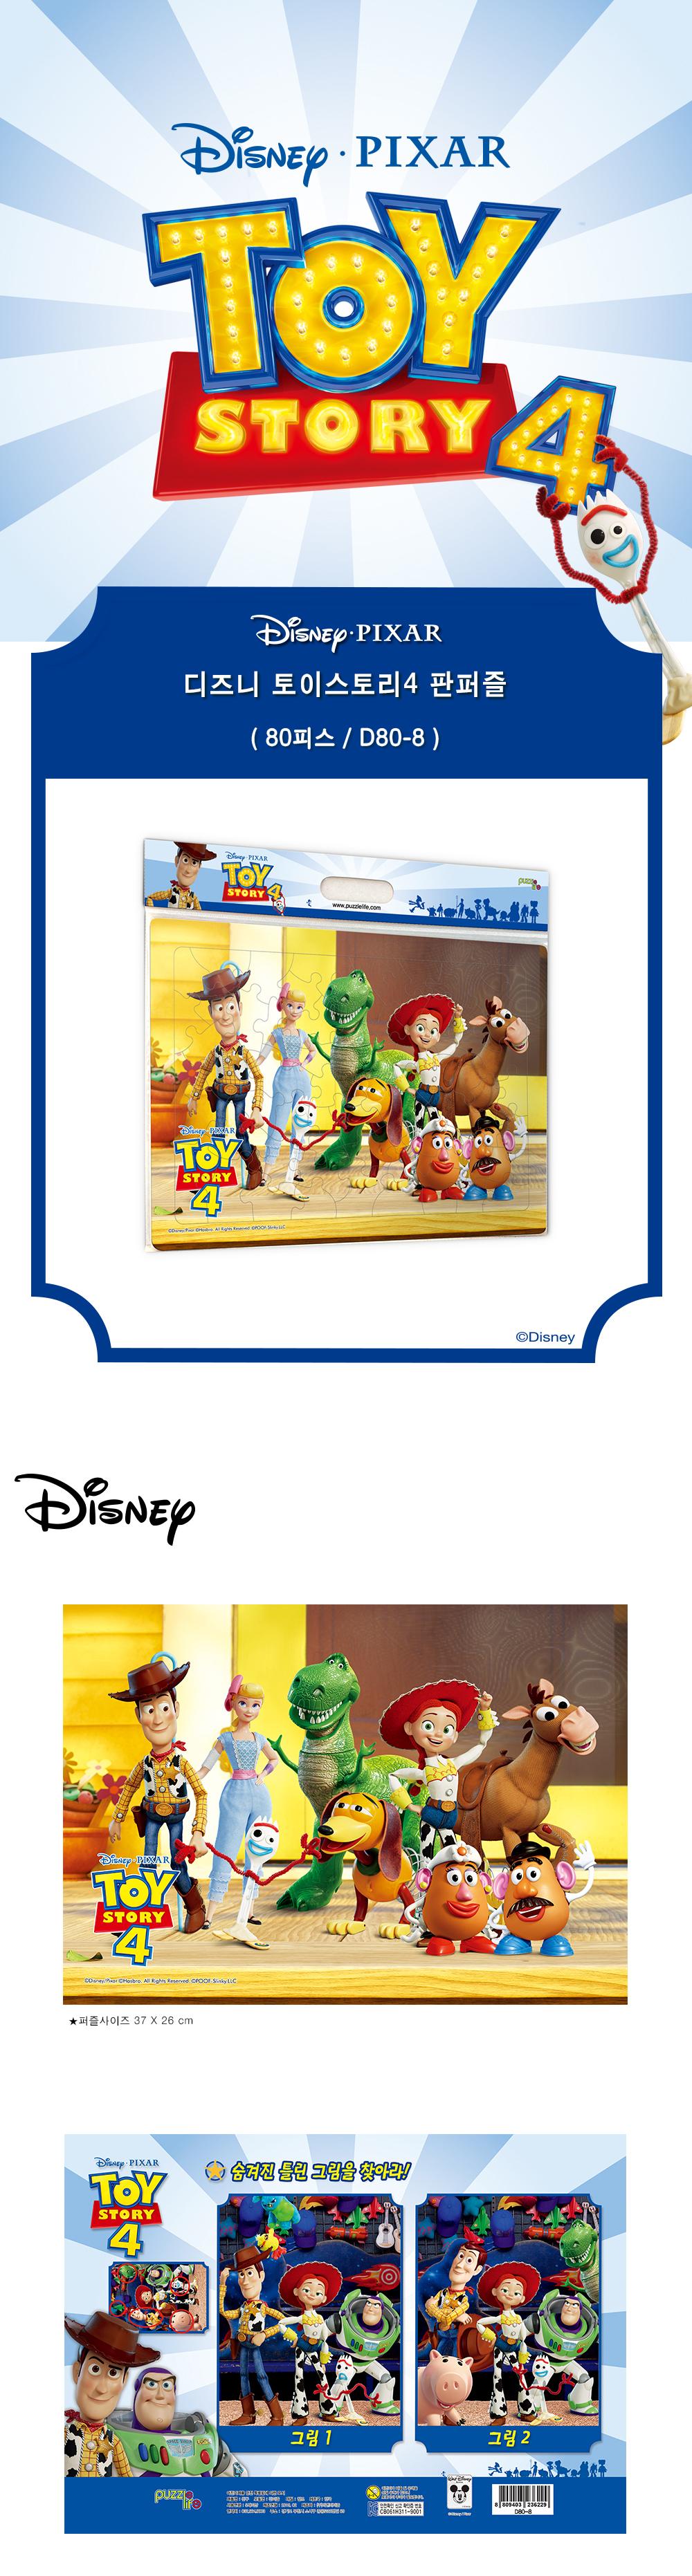 [Disney] 디즈니 토이스토리4 판퍼즐(80피스/D80-8) - 퍼즐라이프, 6,500원, 조각/퍼즐, 캐릭터 직소퍼즐